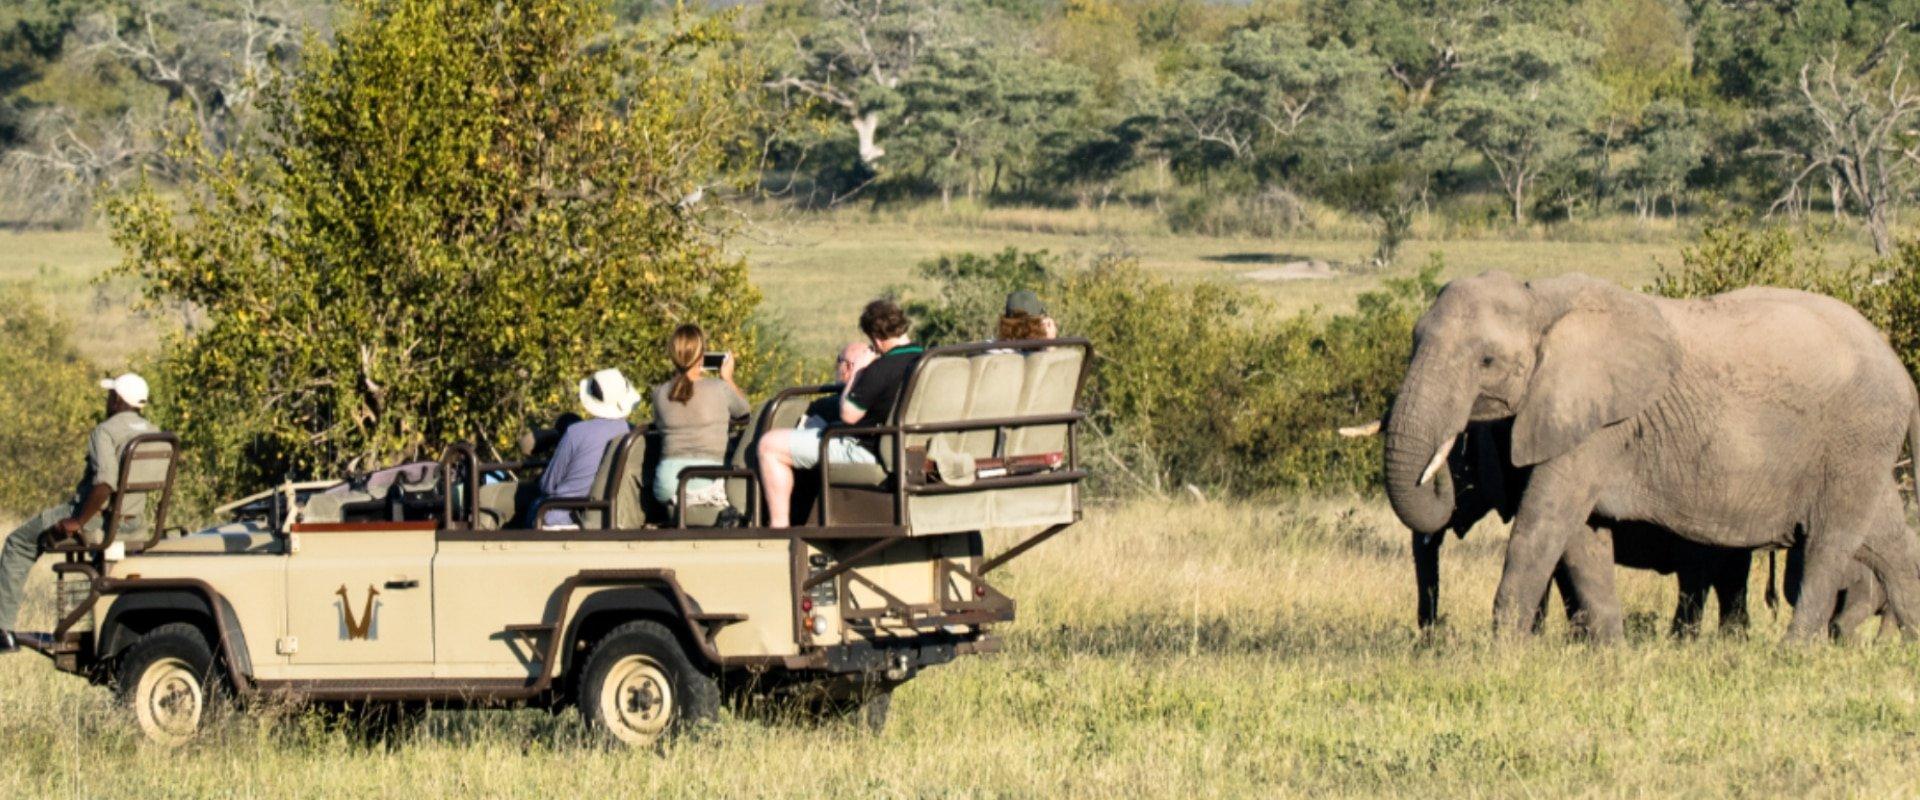 Spectacular wildlife sightings of Africa's Big 5